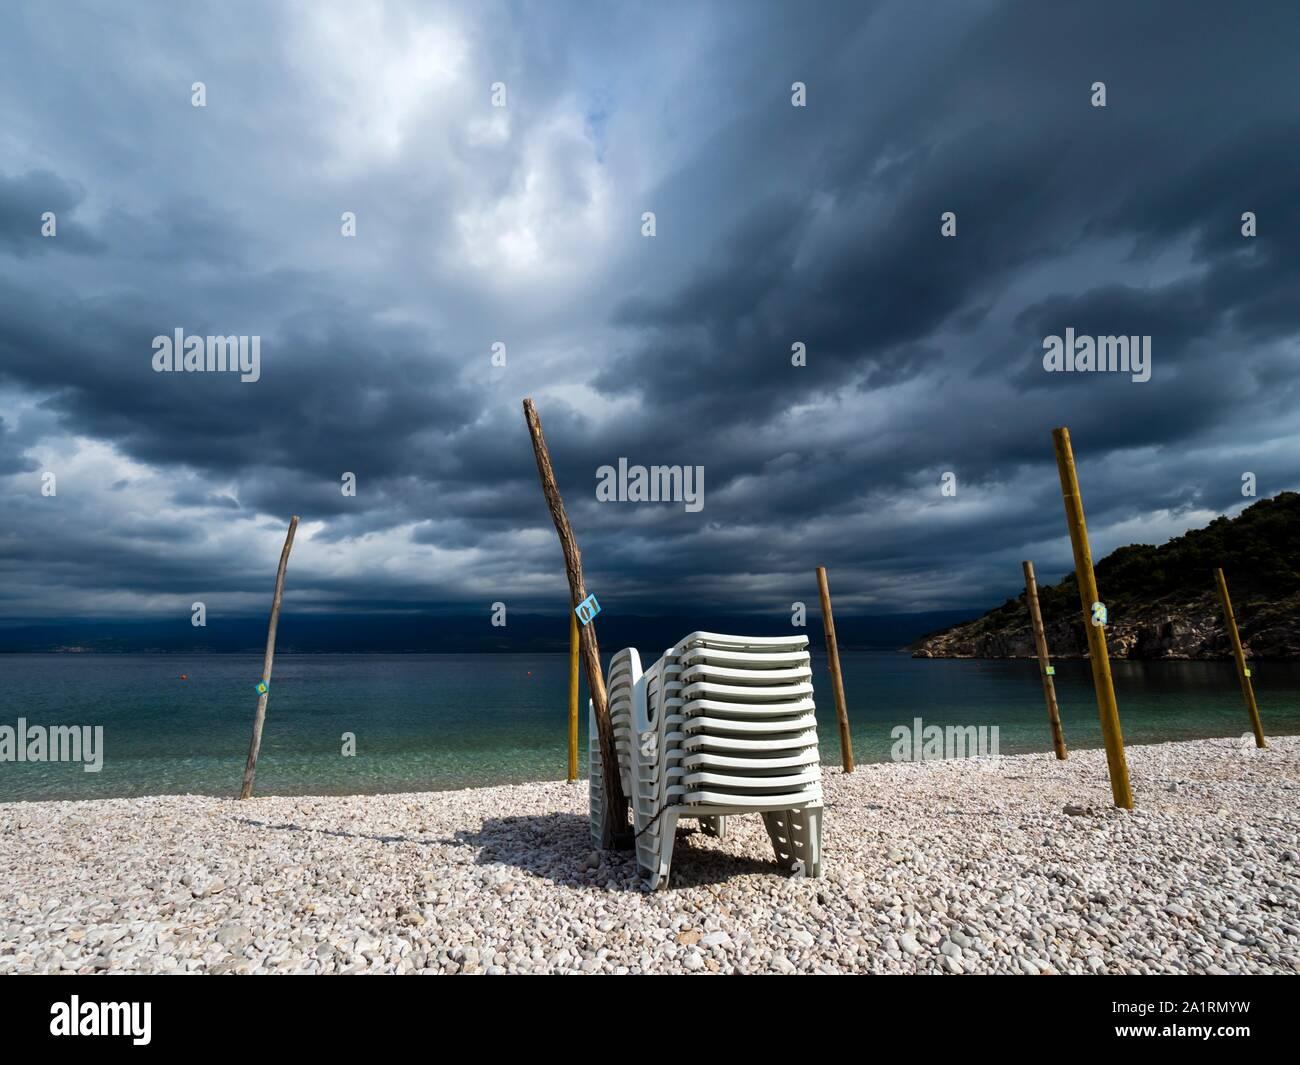 Summer end on beach piled deckchairs stormy dark sky in background empty Stock Photo